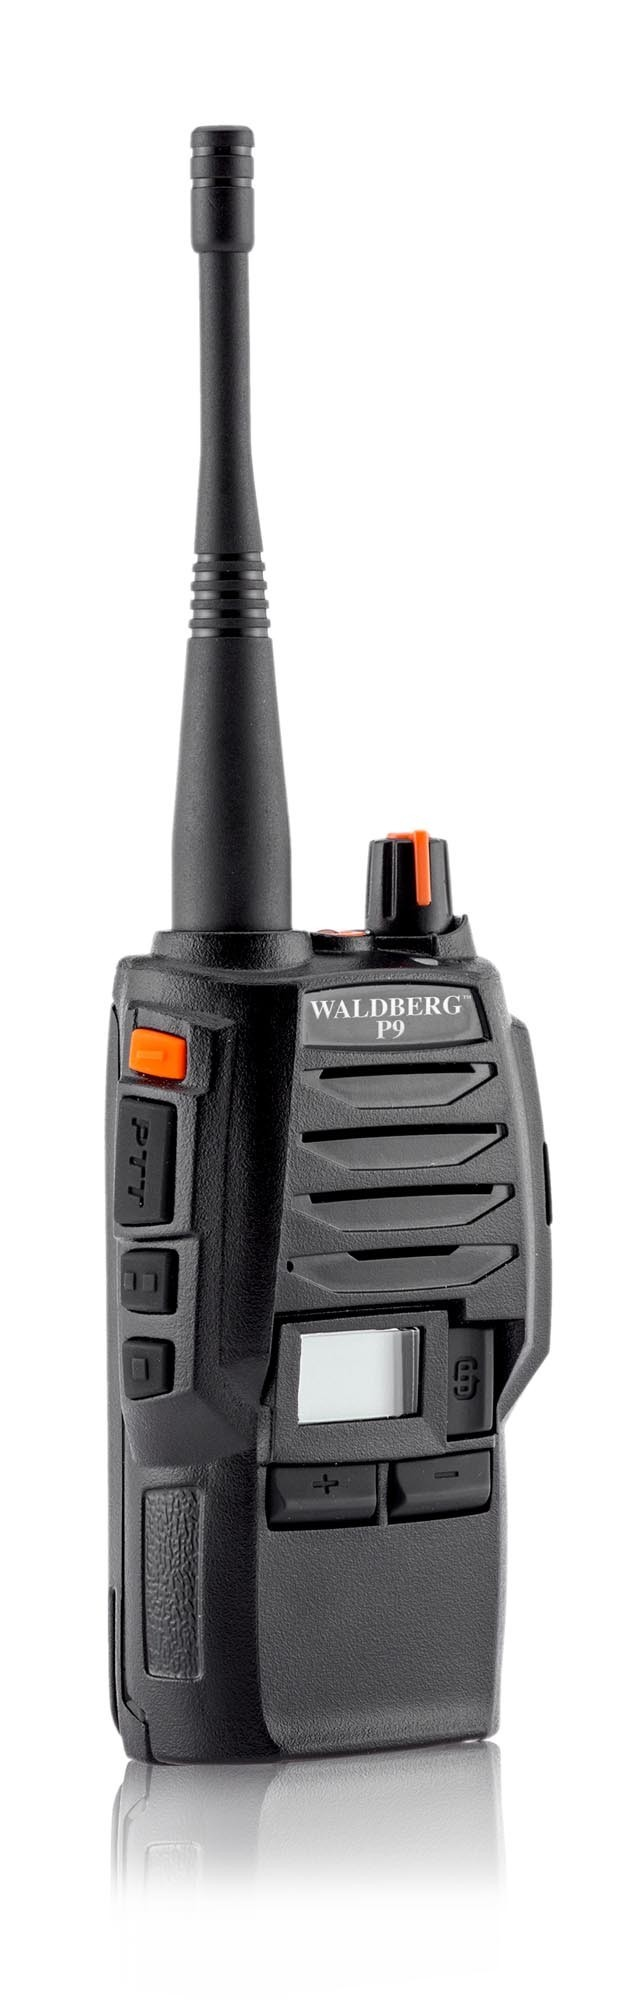 talkie walkie walderg p9 avec oreillette talkies walkies t l phones mobiles made in chasse. Black Bedroom Furniture Sets. Home Design Ideas